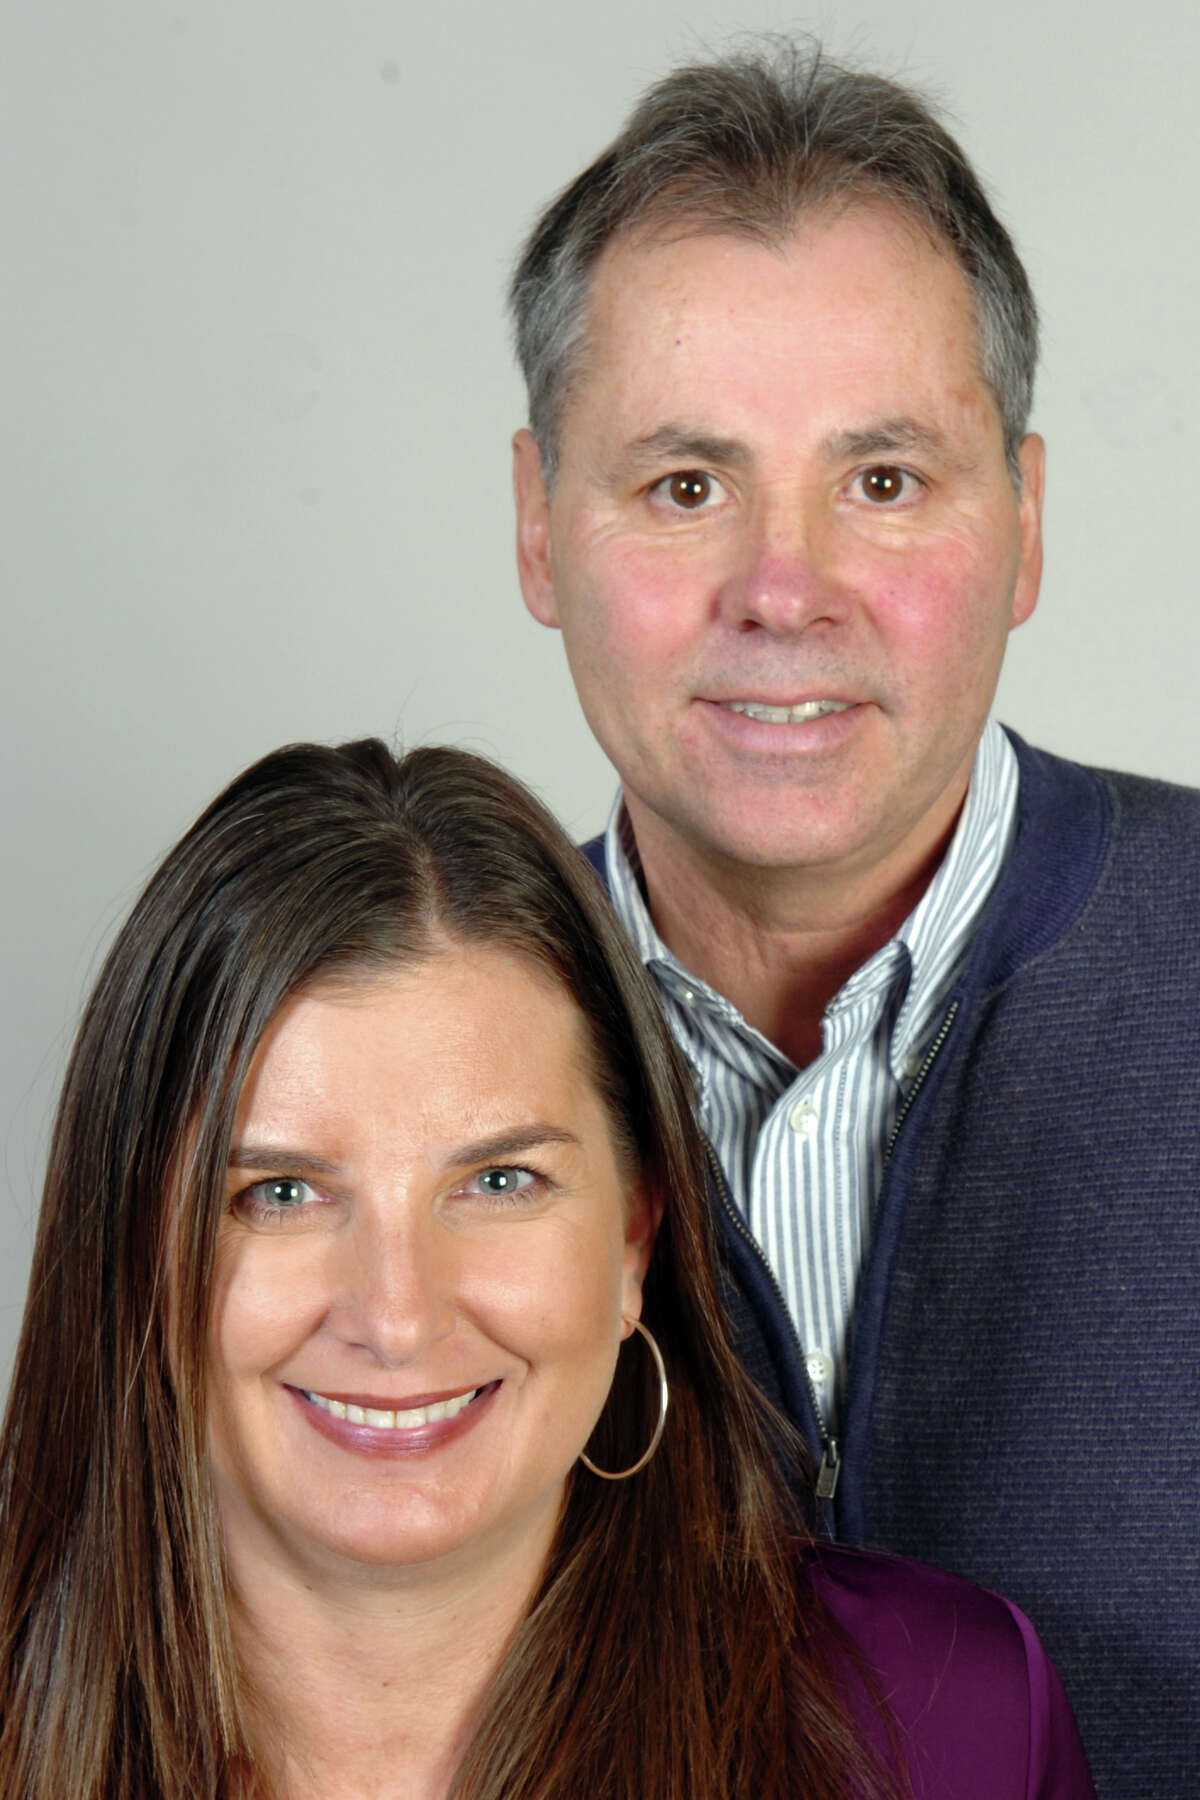 Kelly Cummings and Bill Pelletier, of Bridgeport. Light in the Storm, Nov. 8th, 2012.